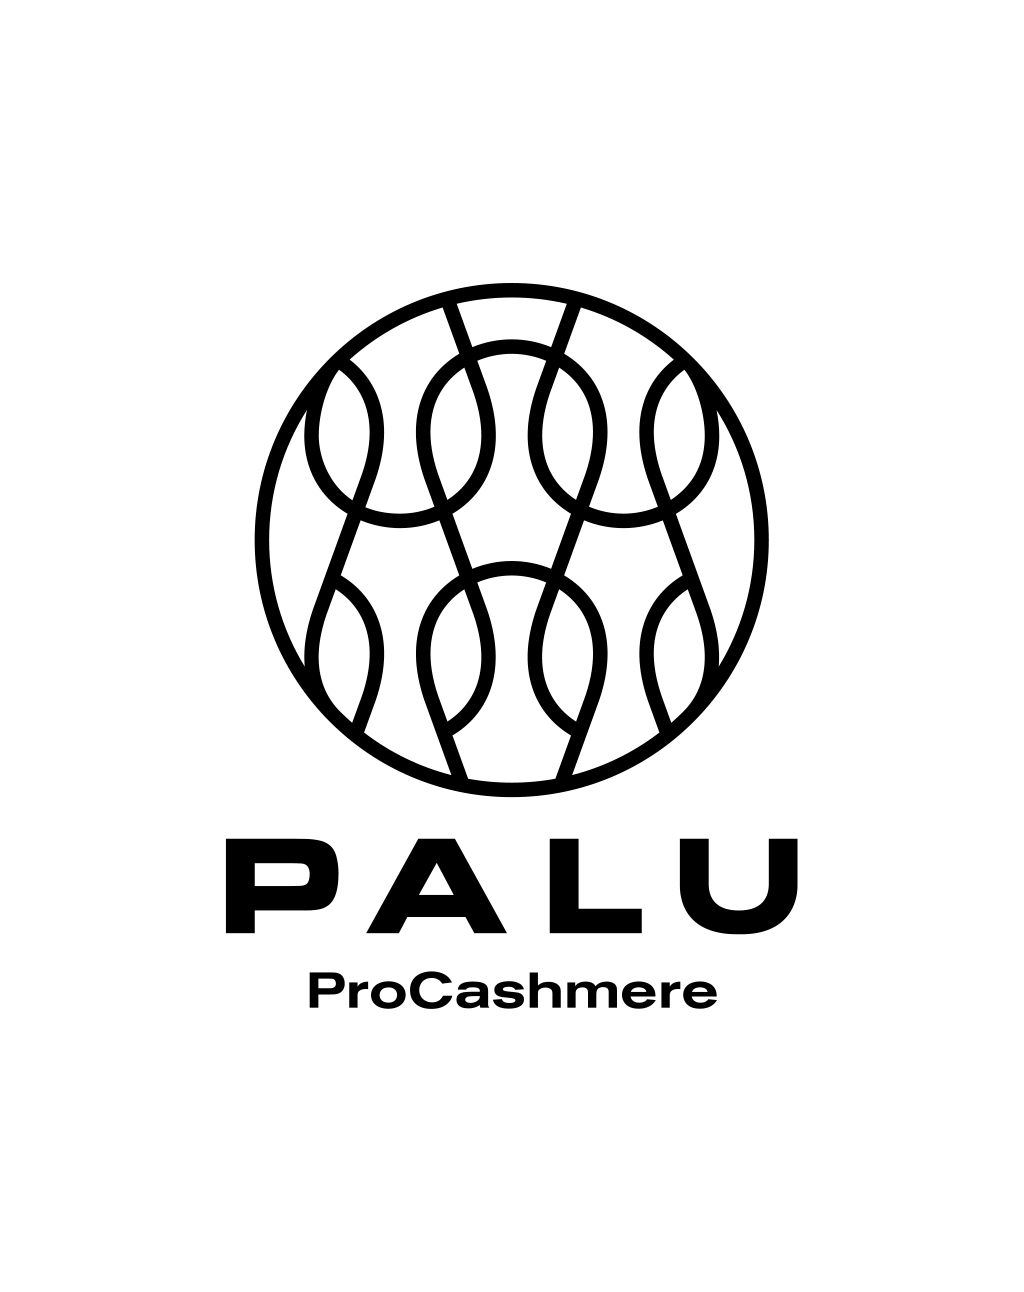 PALU Ltd